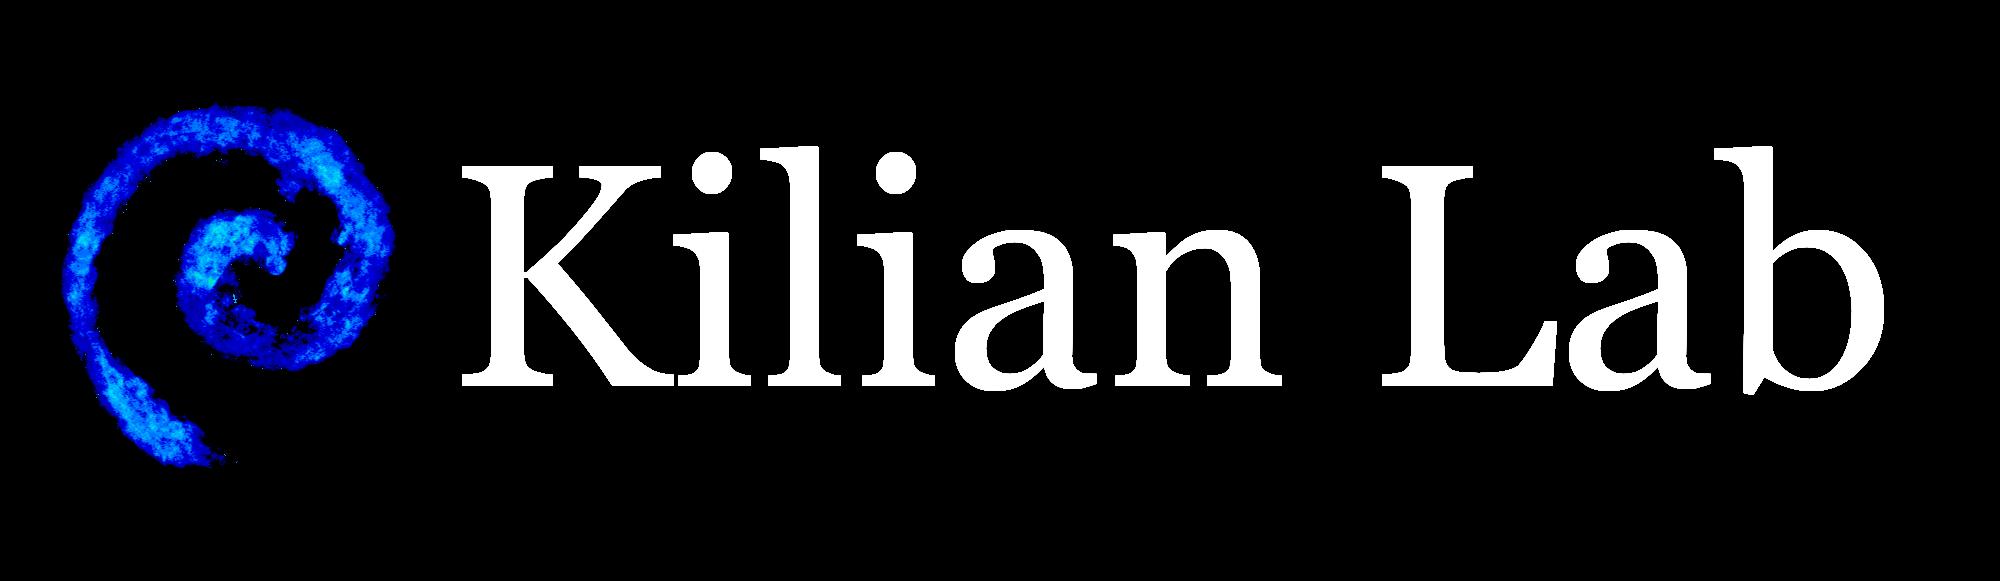 Dr  Kris Kilian - Kilian Lab